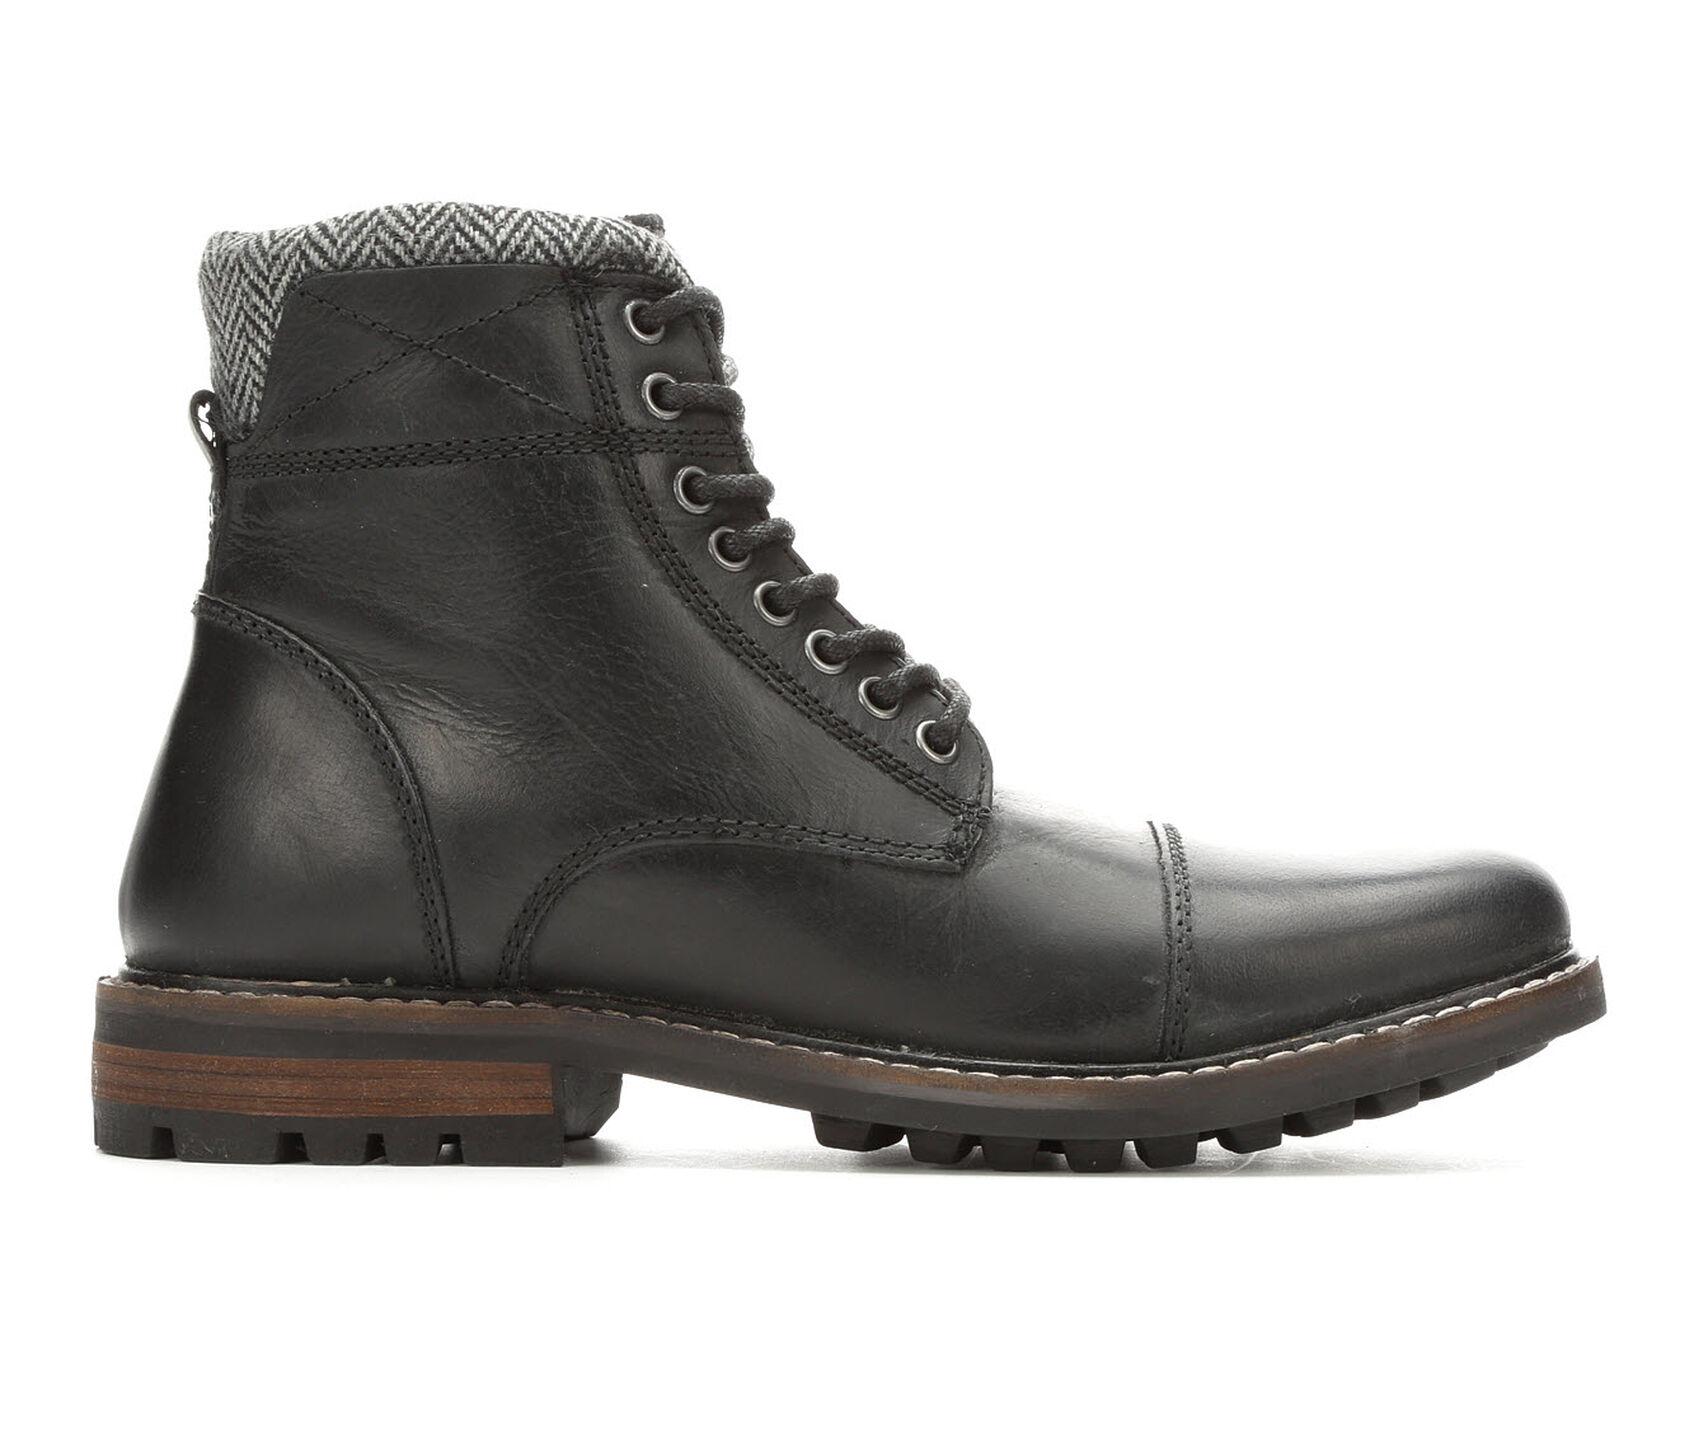 794ecd3afea Men's Crevo Camden Boots